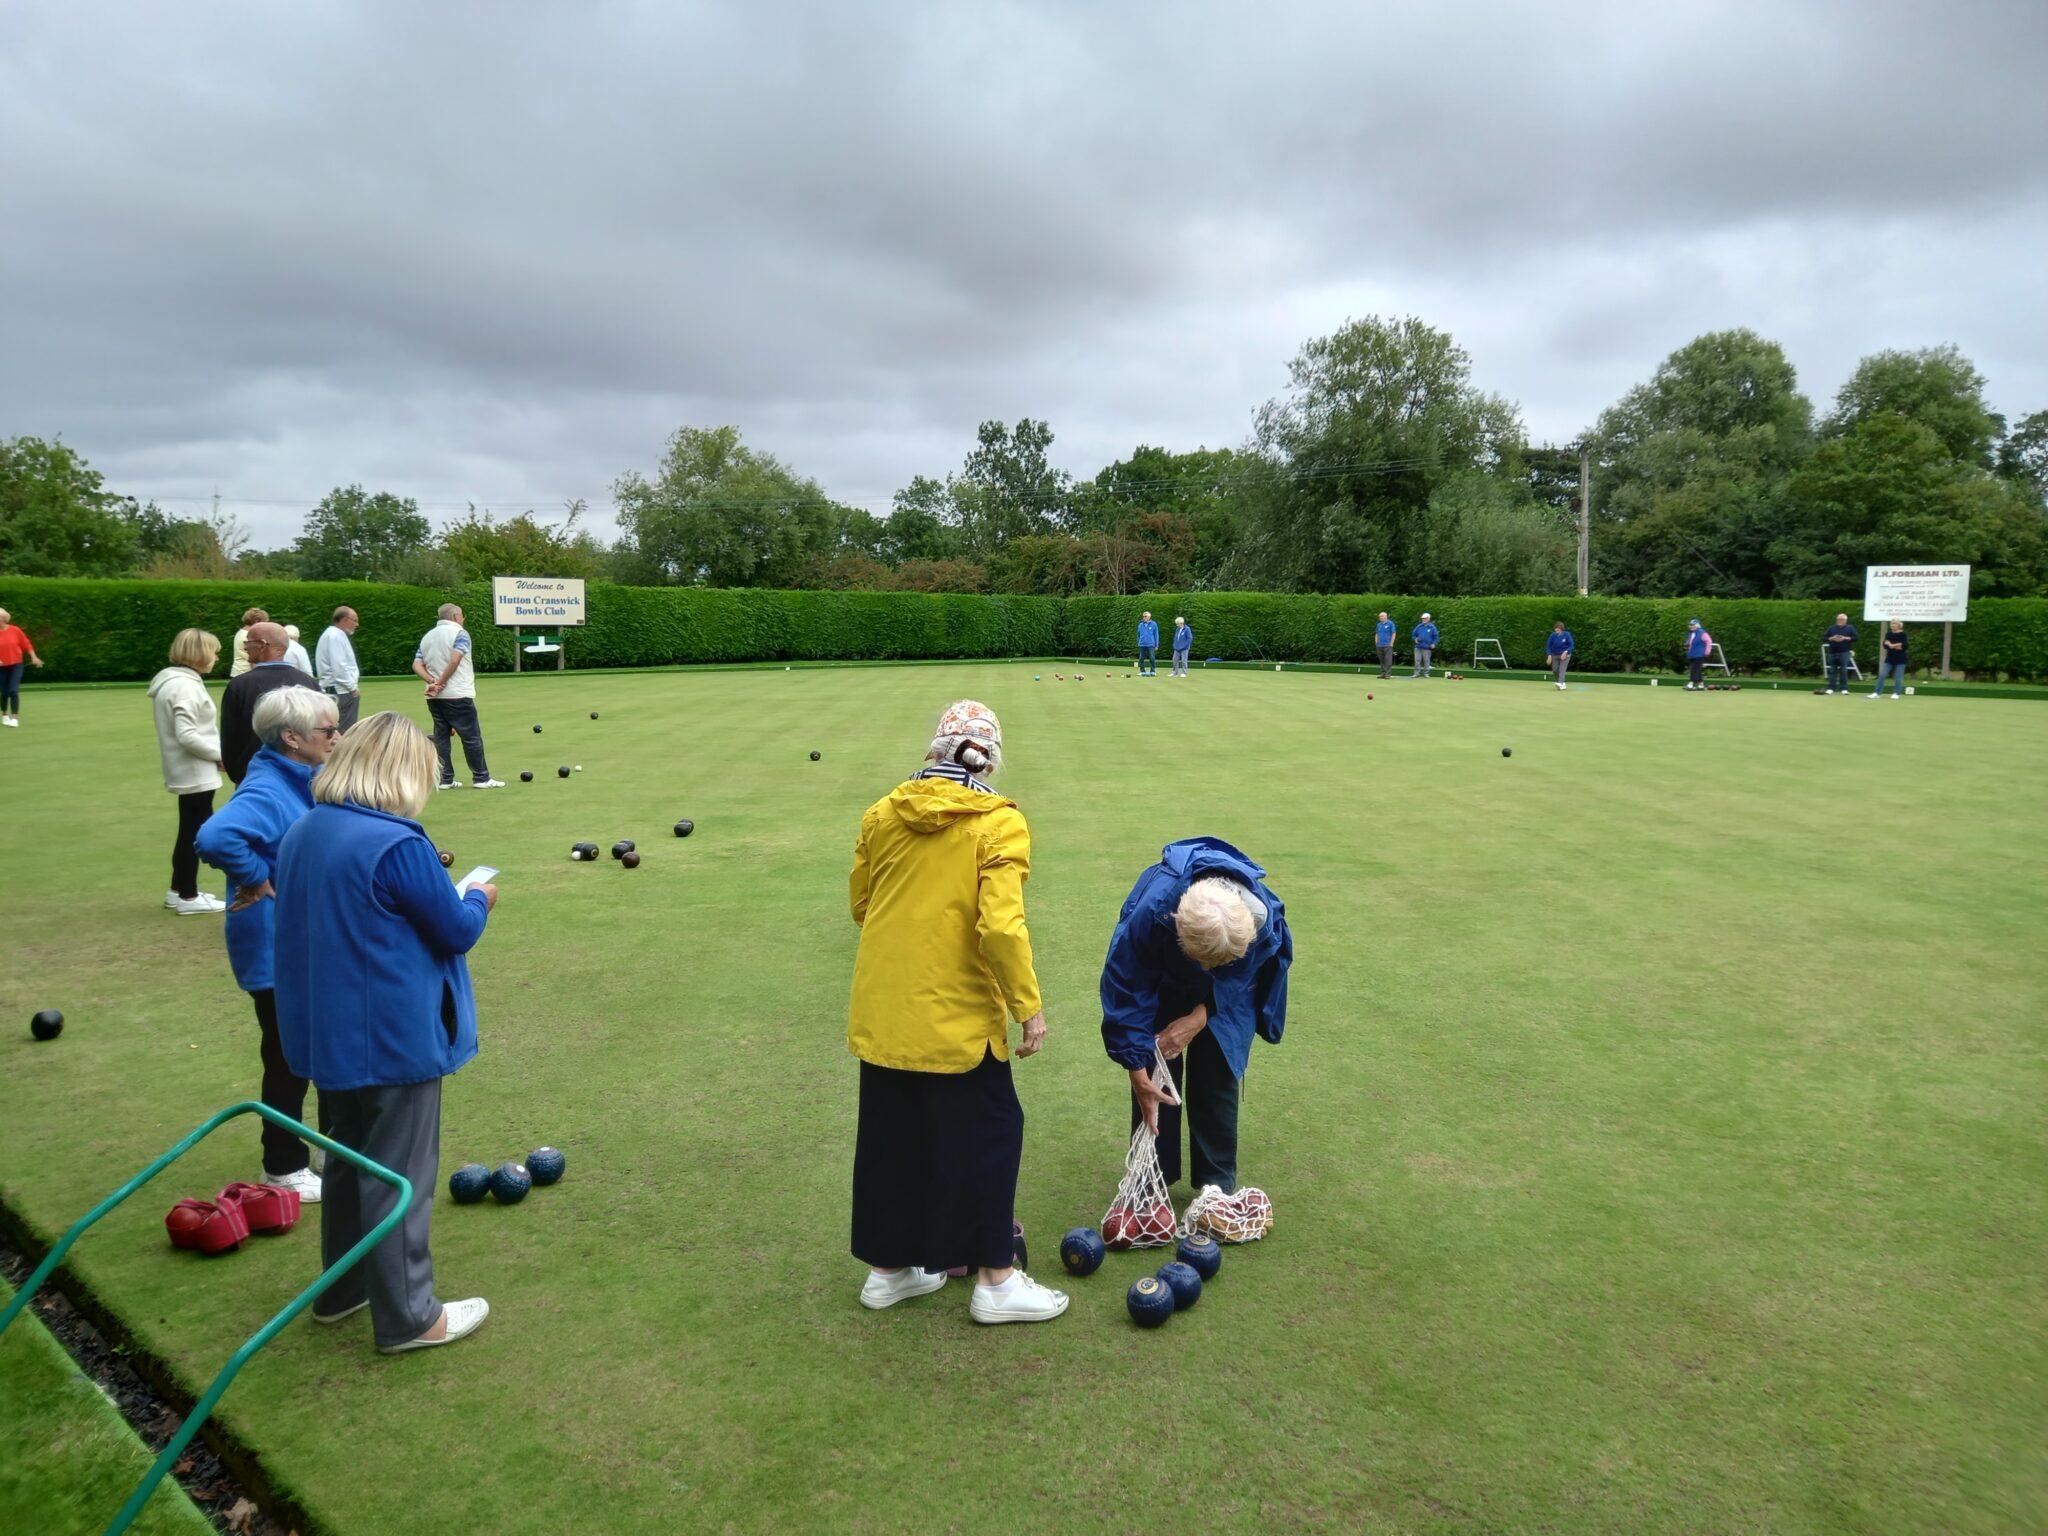 Huton Cranswick Bowls Club